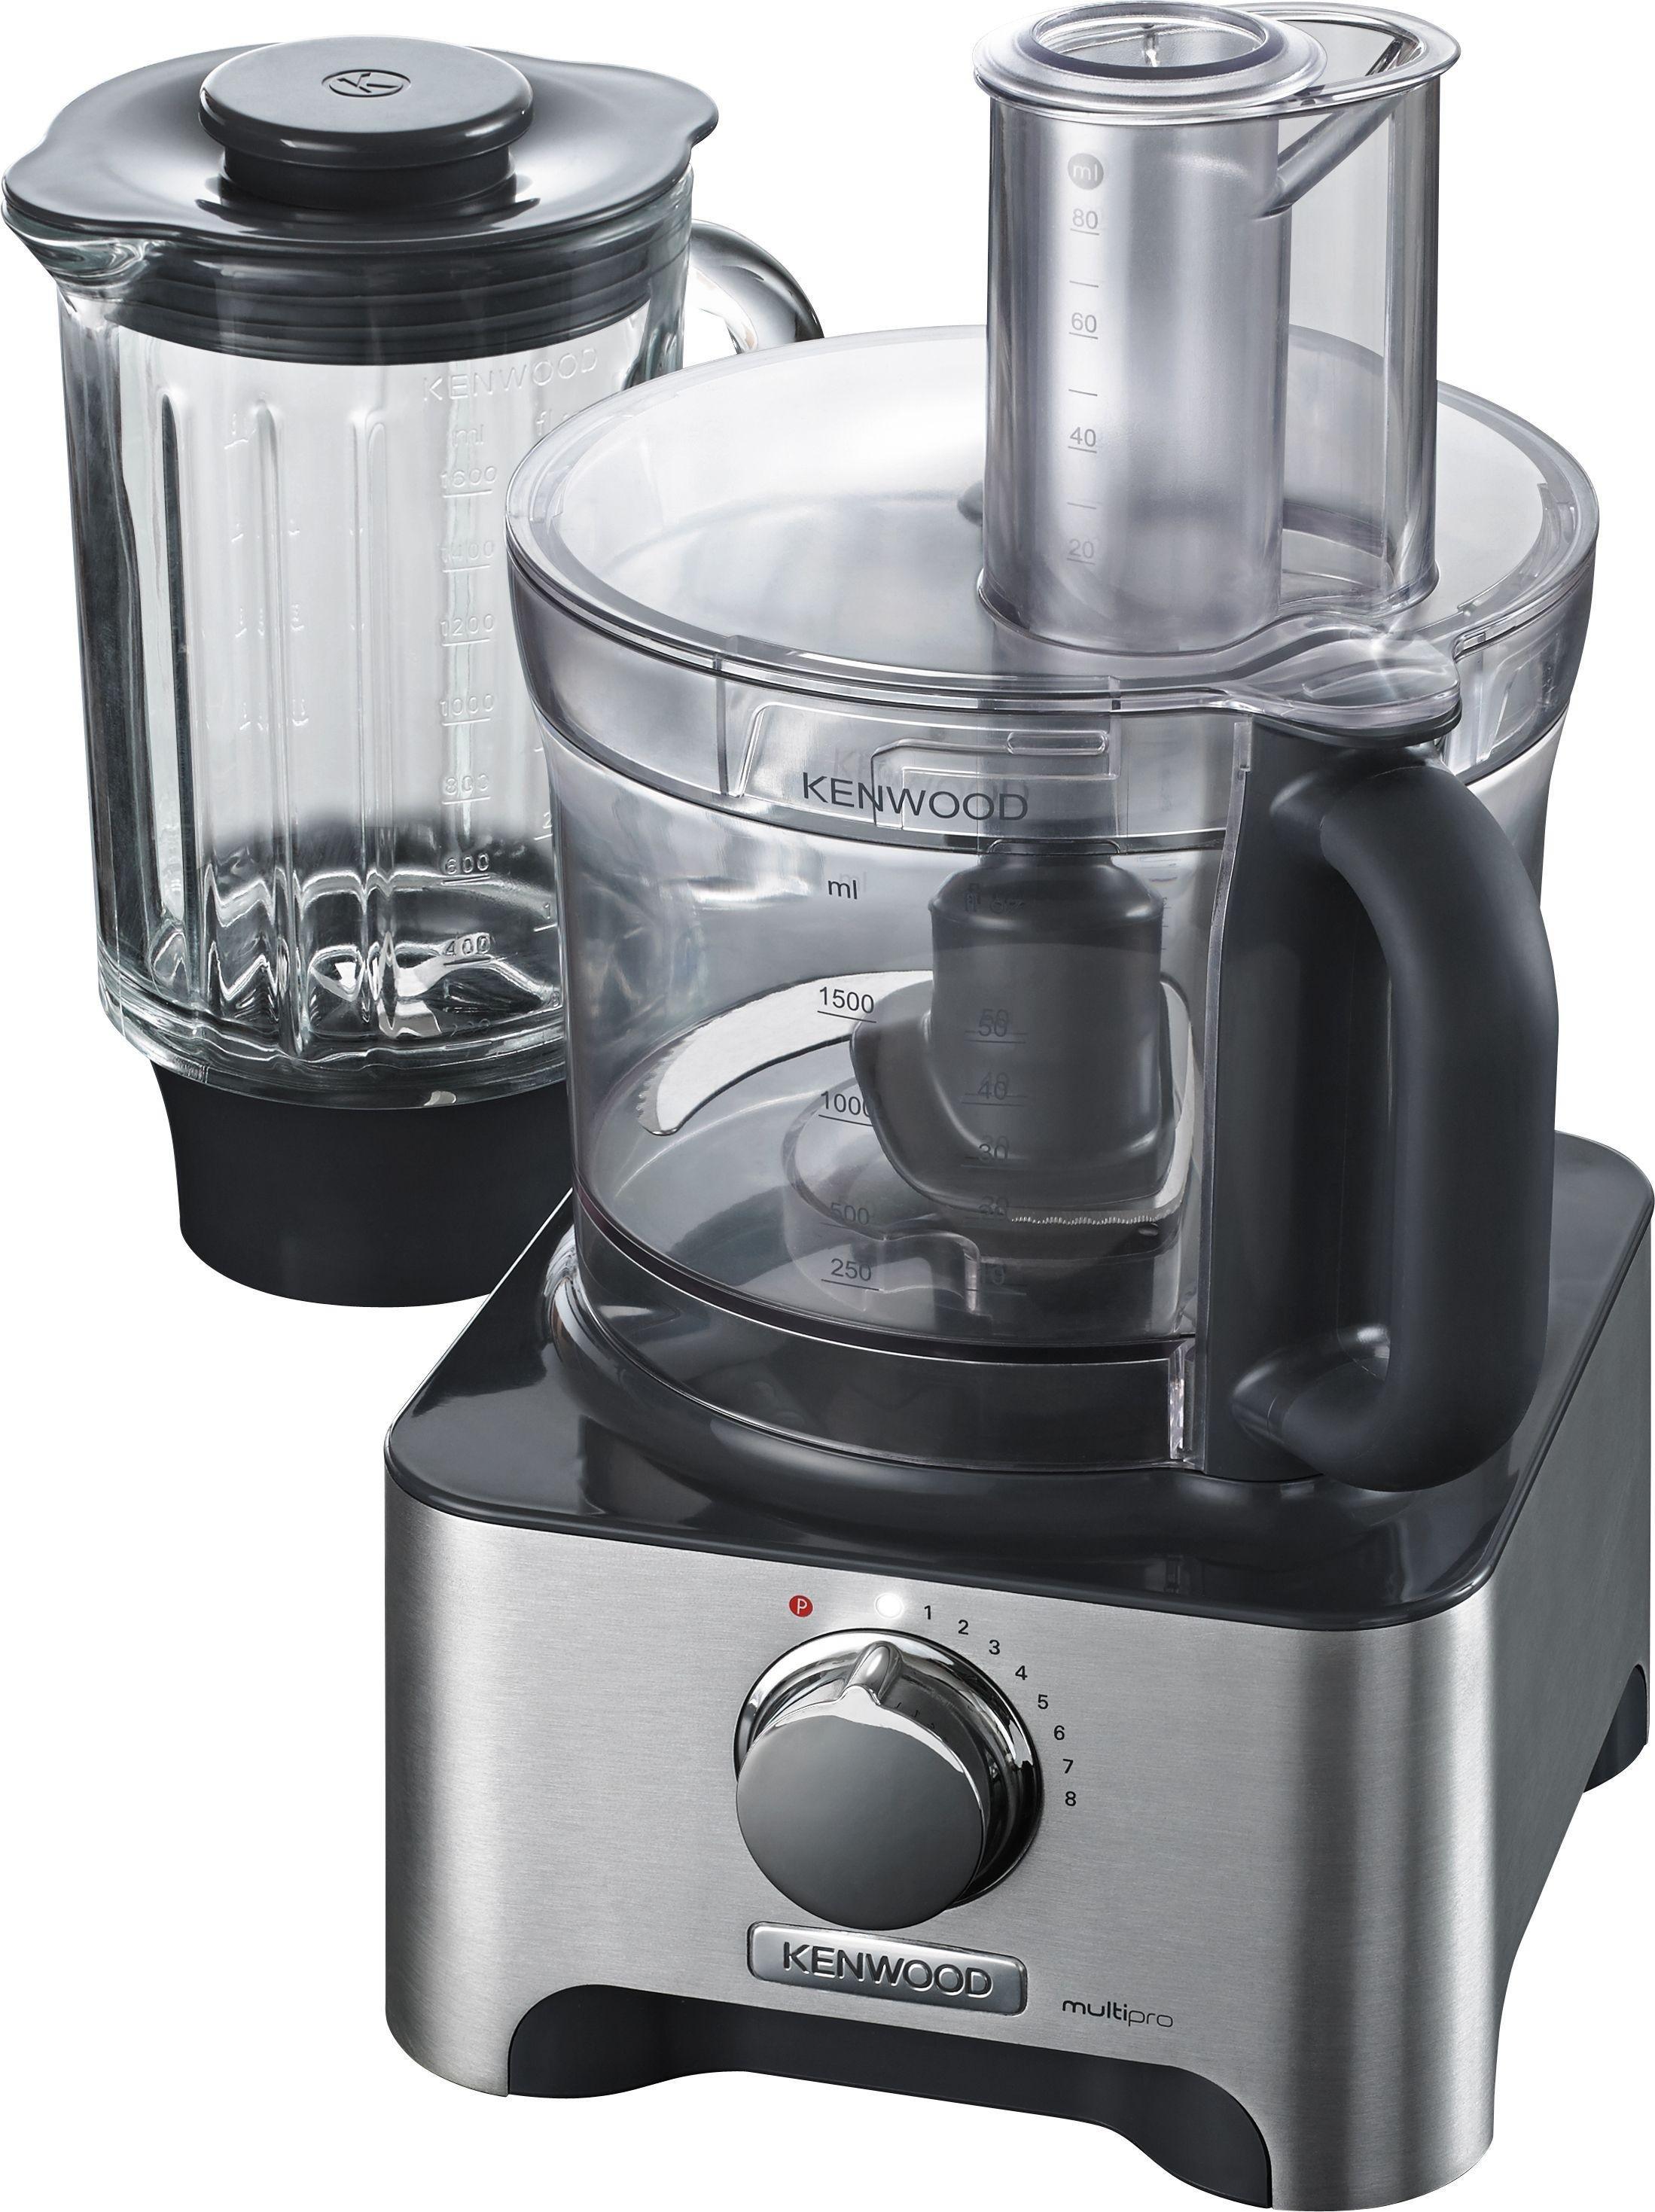 Cuisinart Food Processor Juice Extractor Attachment